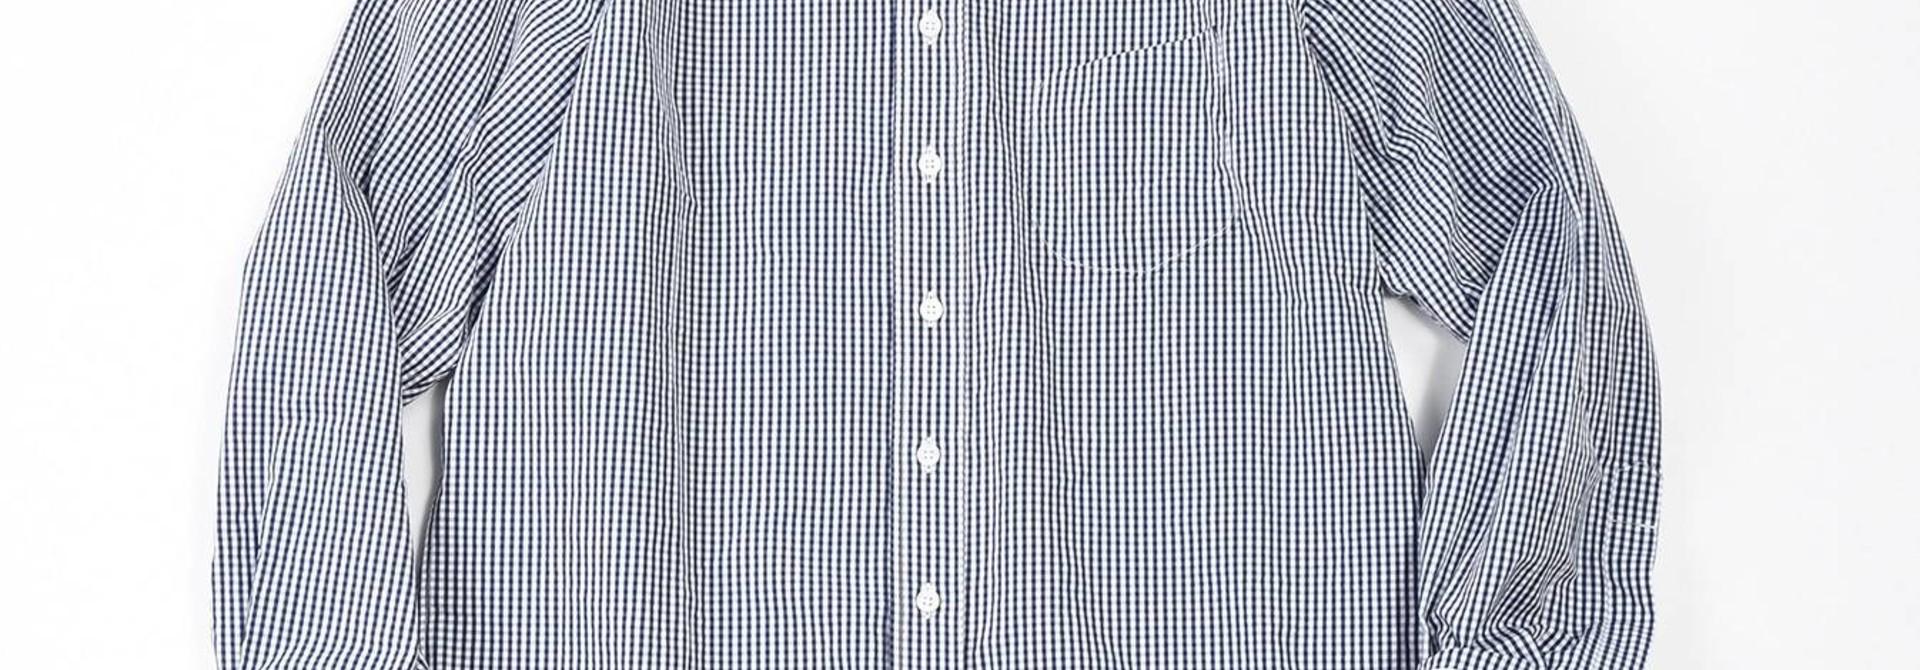 180/3 Suvin Cotton Button Down Shirt